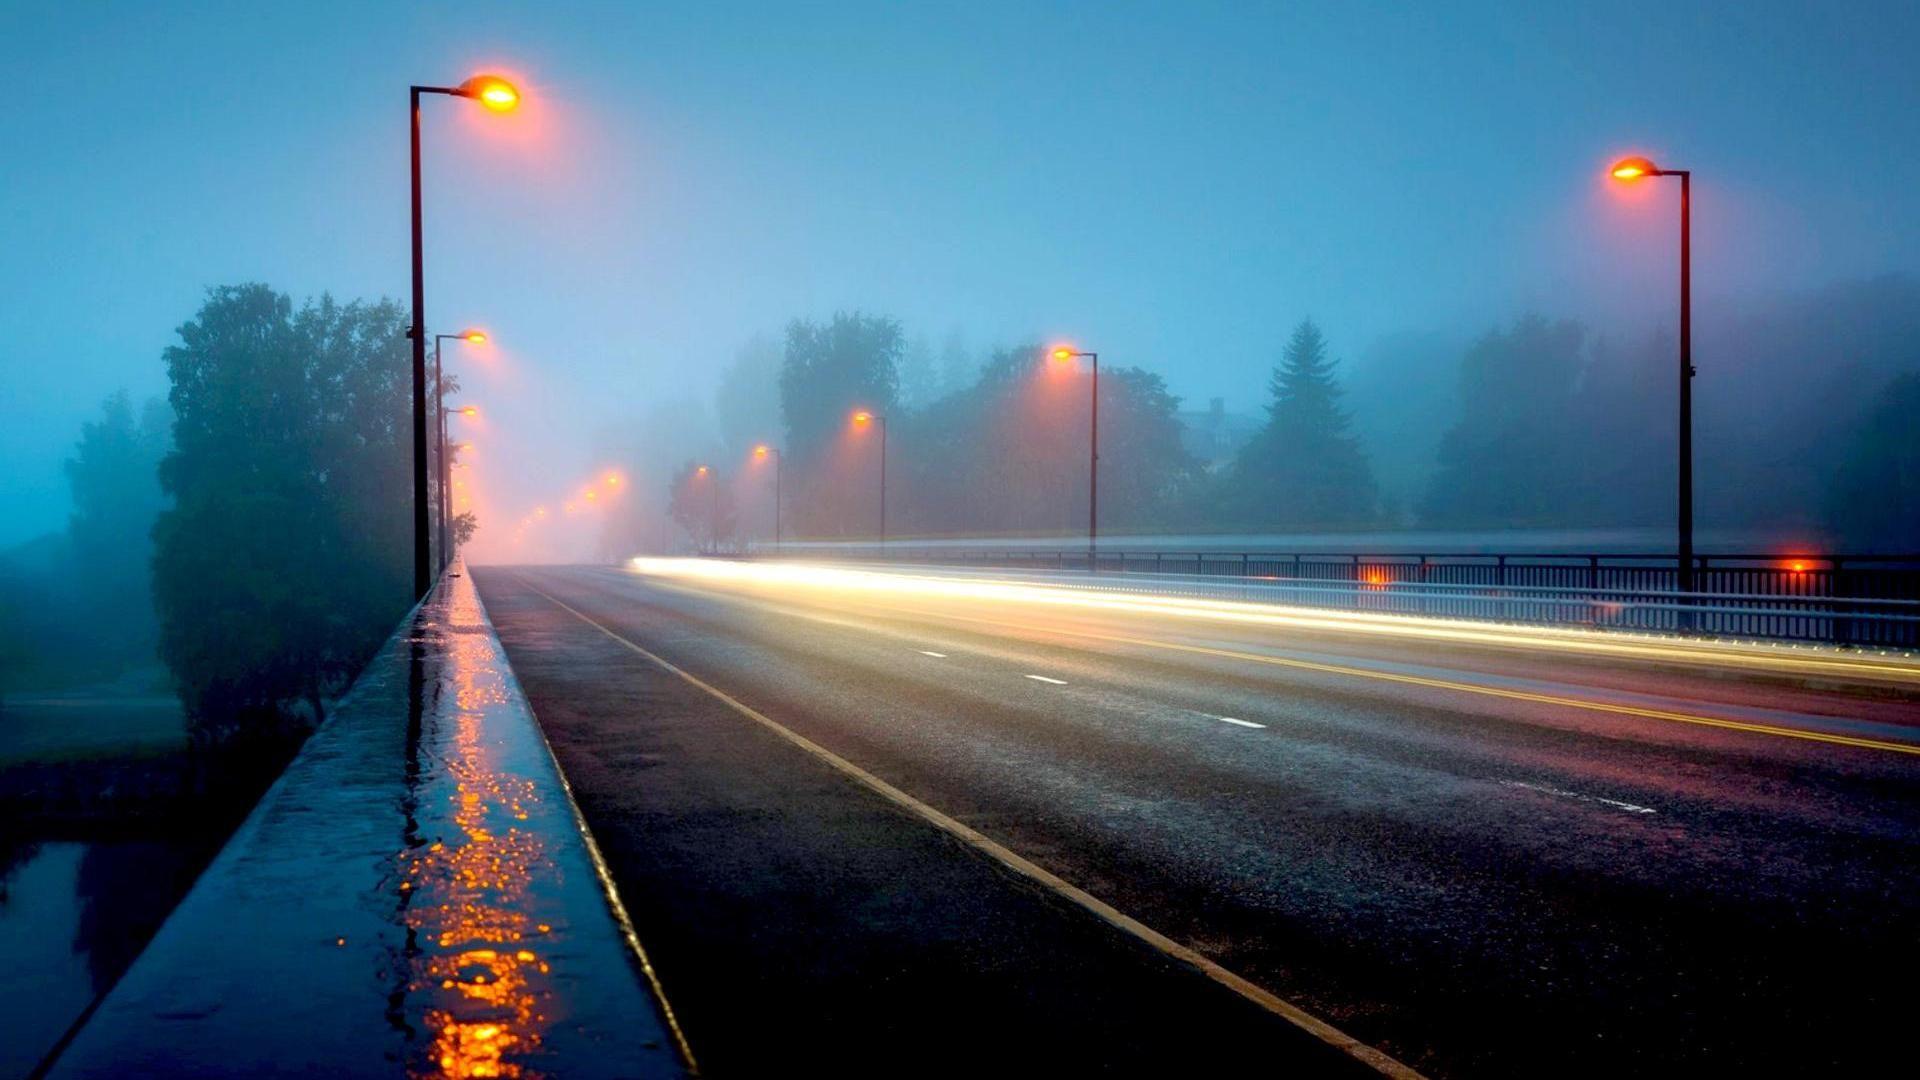 A Highway Bridge In A Foggy Rainy Night HD Desktop Background 1920x1080